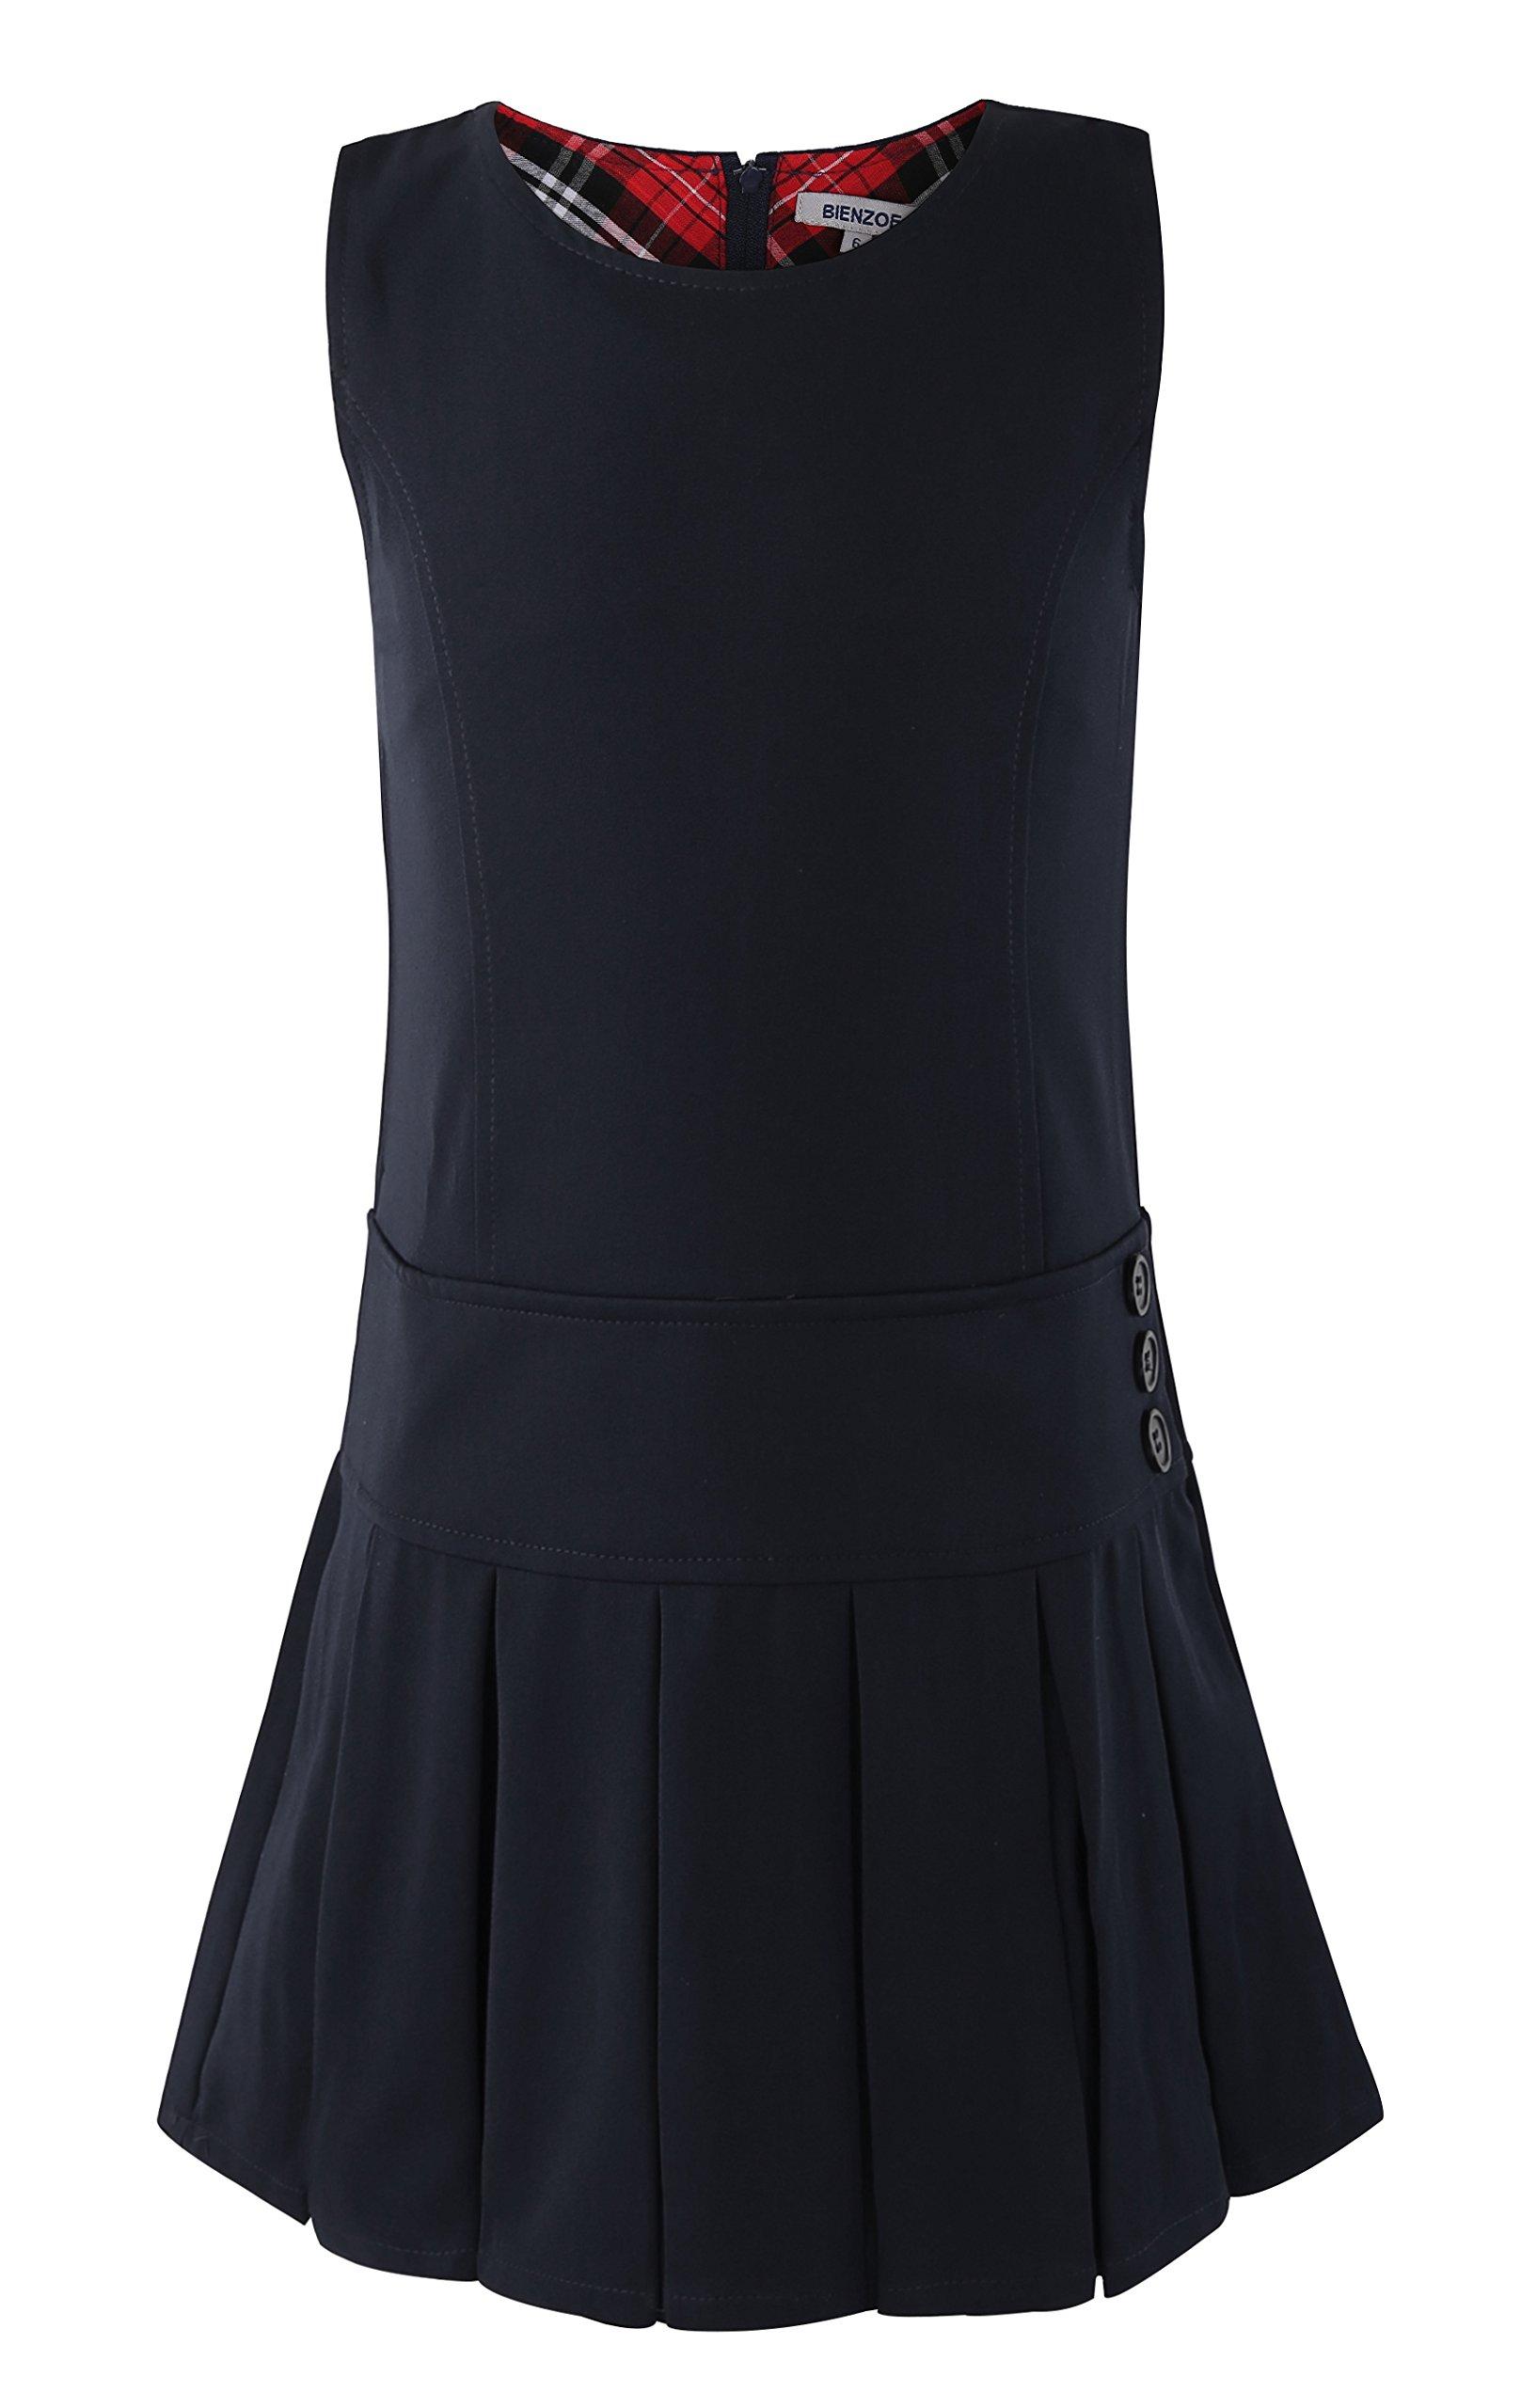 Bienzoe Girl's Stretchy Pleated Durable School Uniforms Jumper Black 6X